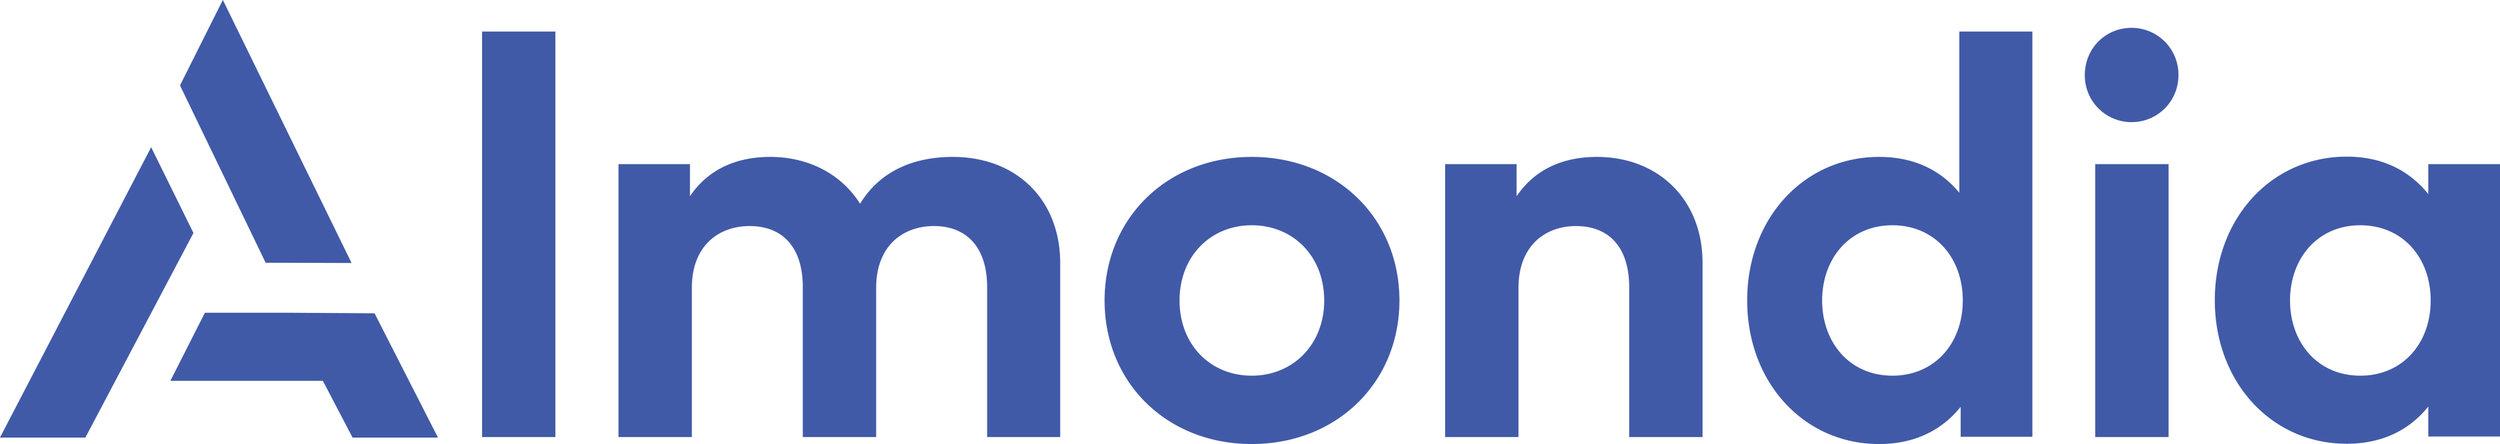 Almondia-Wortmarke-blau.jpg